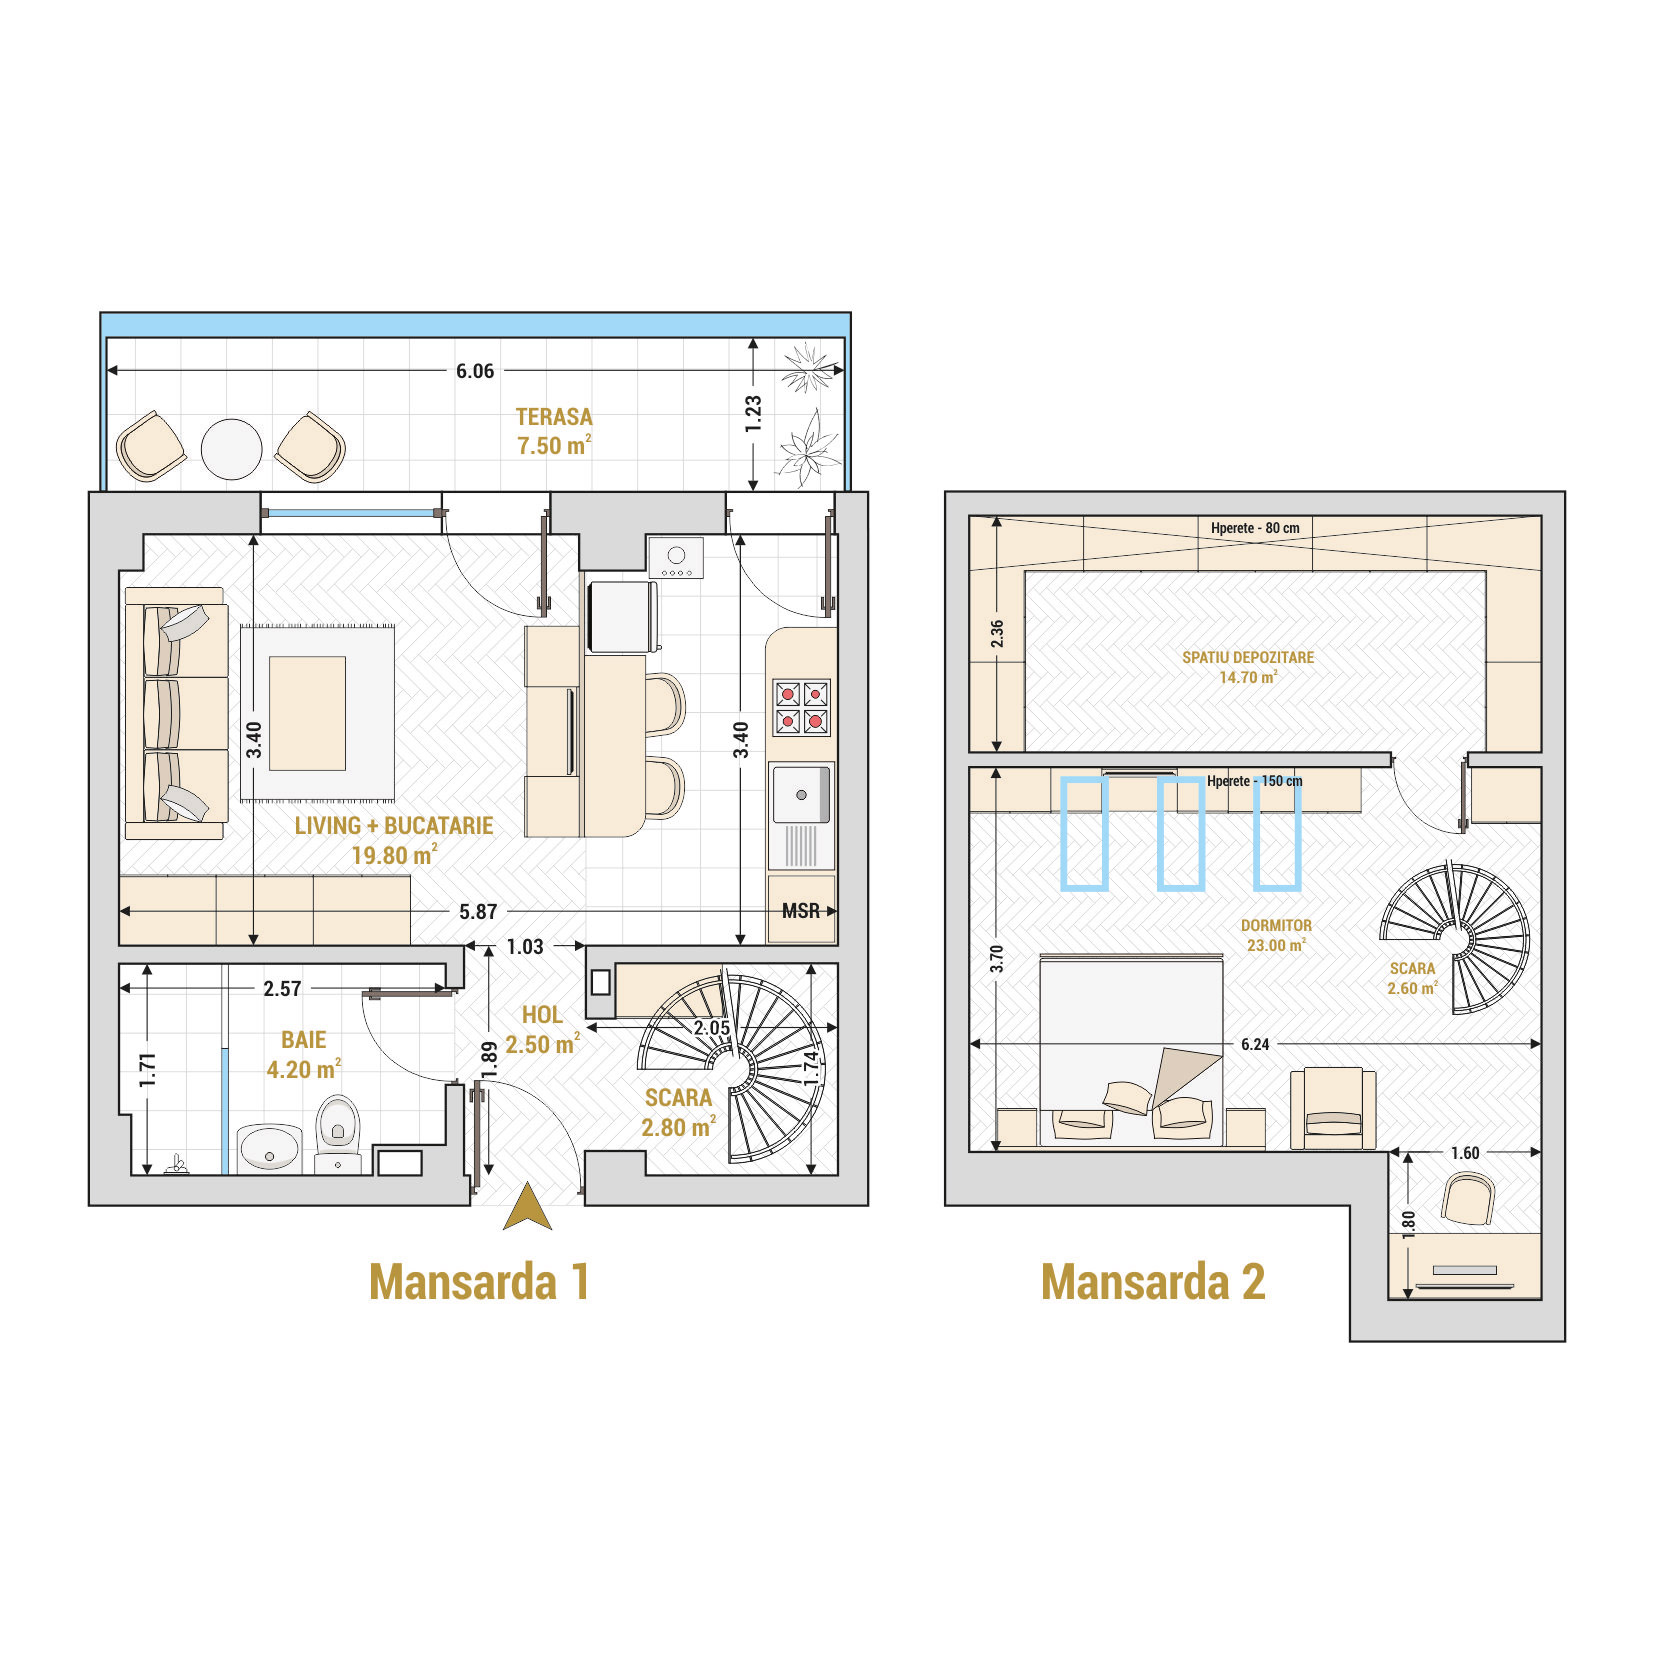 Duplex cu 2 camere Bucuresti - Catedral Residence - Marriott, Piata Unirii, 13 Septembrie, Izvor - Suprafata utila totala - 77.10 metri patrati